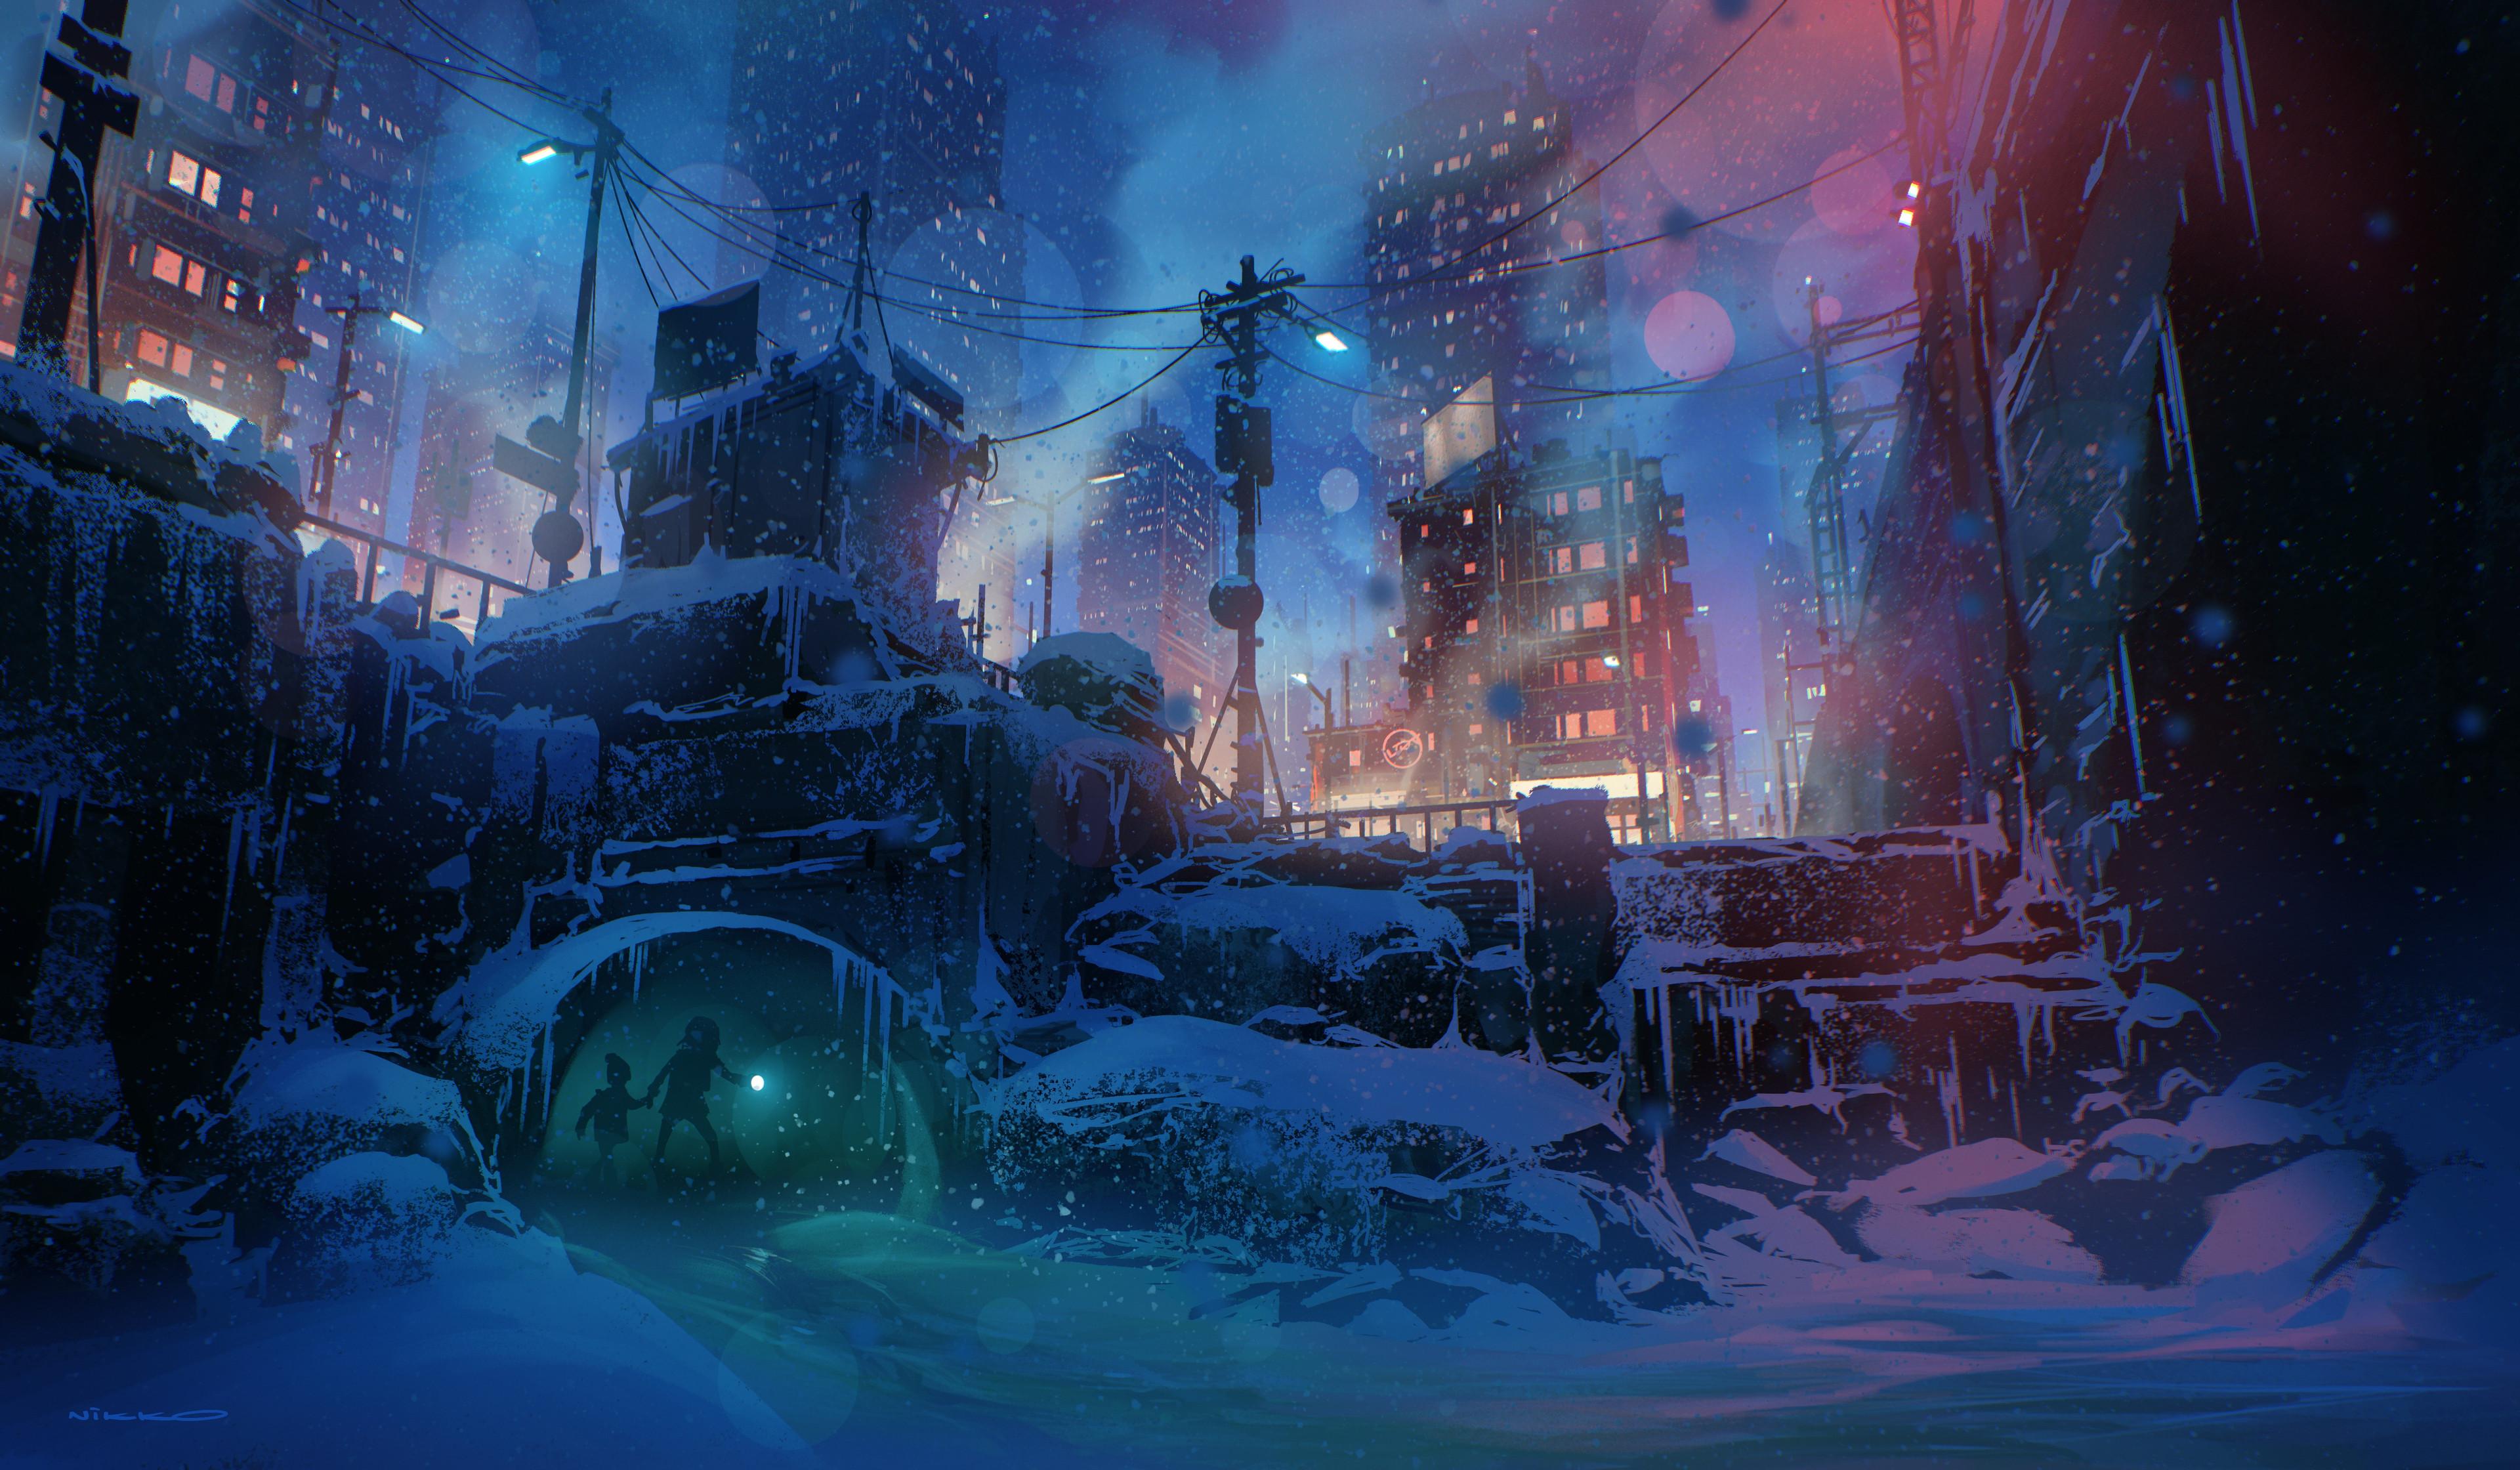 General 3840x2240 Nikolai Lockertsen digital art digital painting snowflakes snow covered winter artwork night snow fan art ArtStation